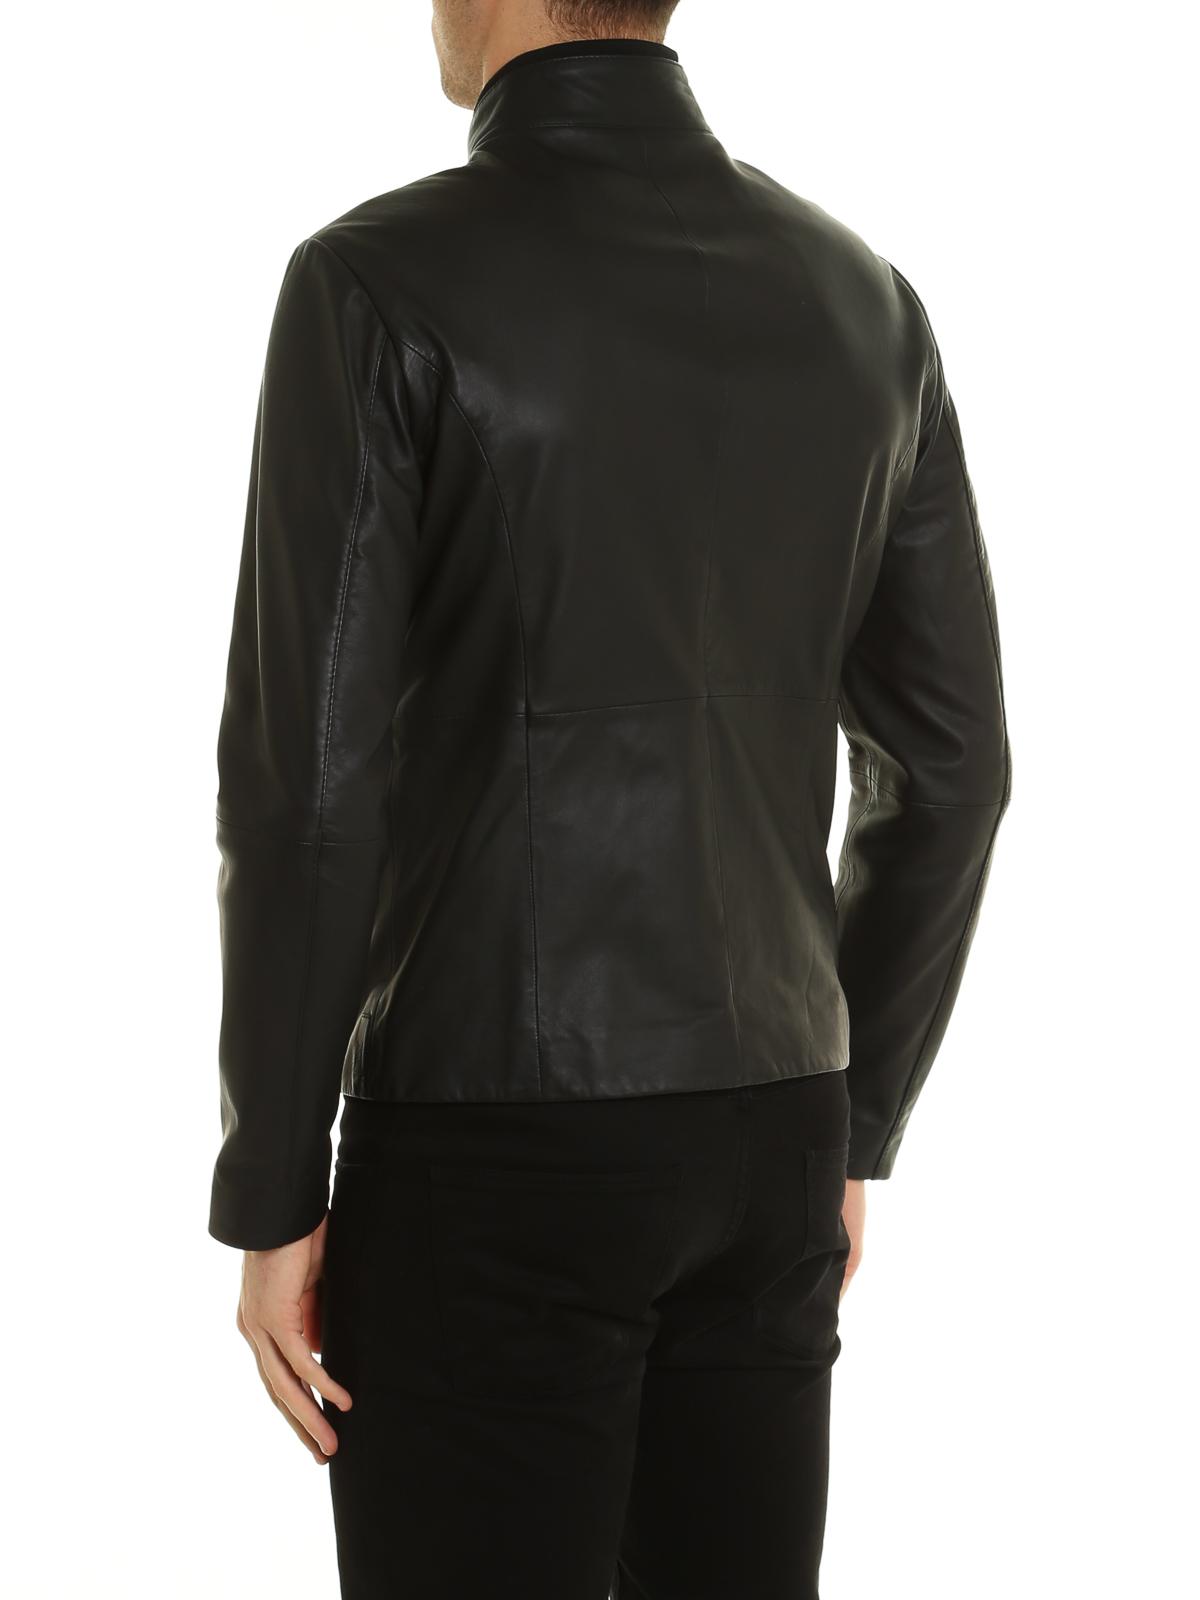 wholesale dealer a008b 09642 Armani Collezioni - レザーコート メンズ - 黒 - レザー ...